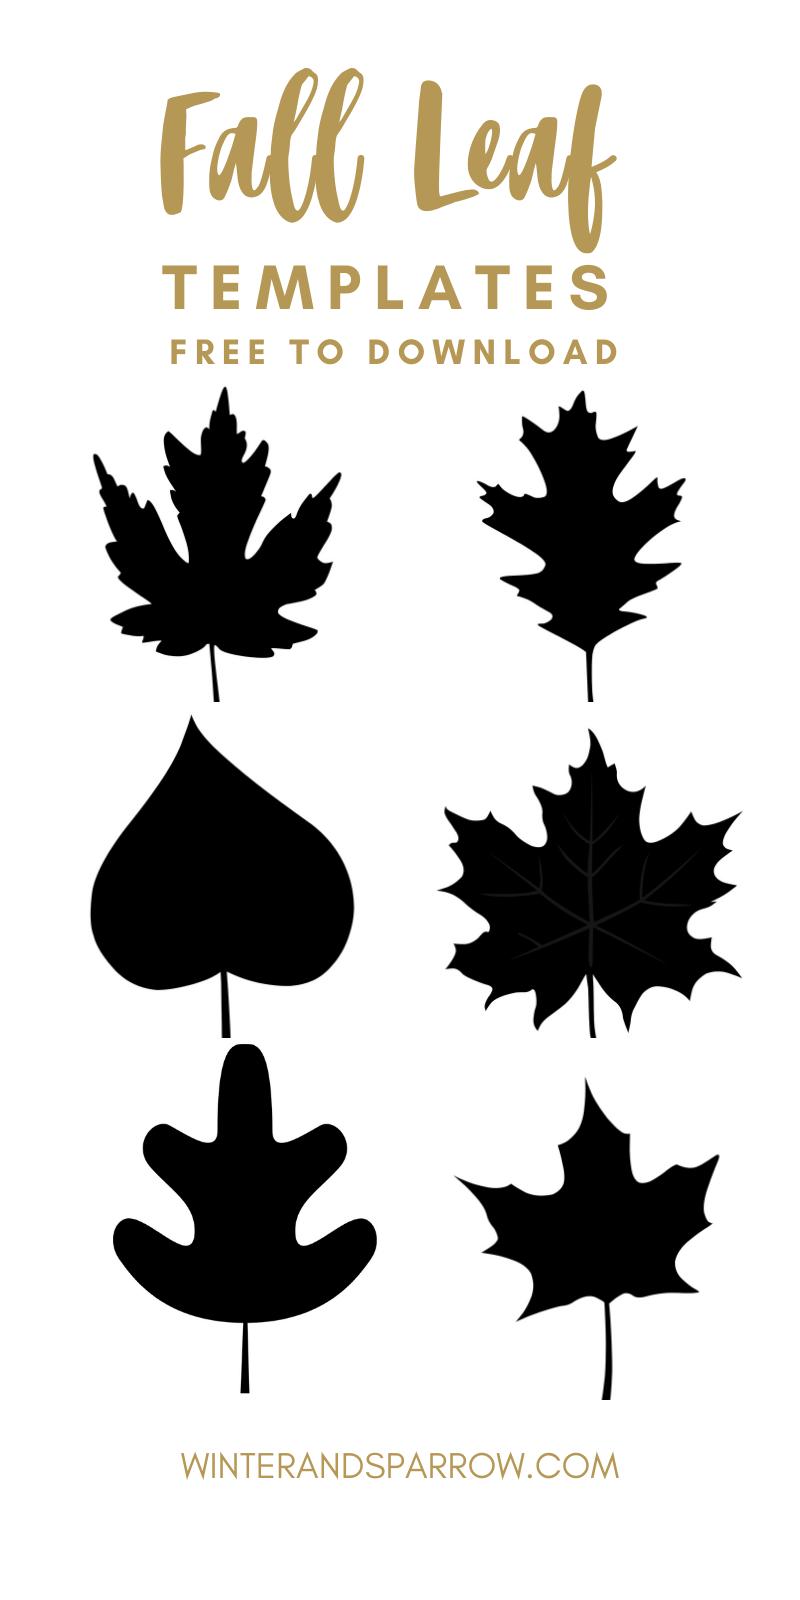 6 Free Fall Leaf Templates | Fall leaf template, Leaf ...